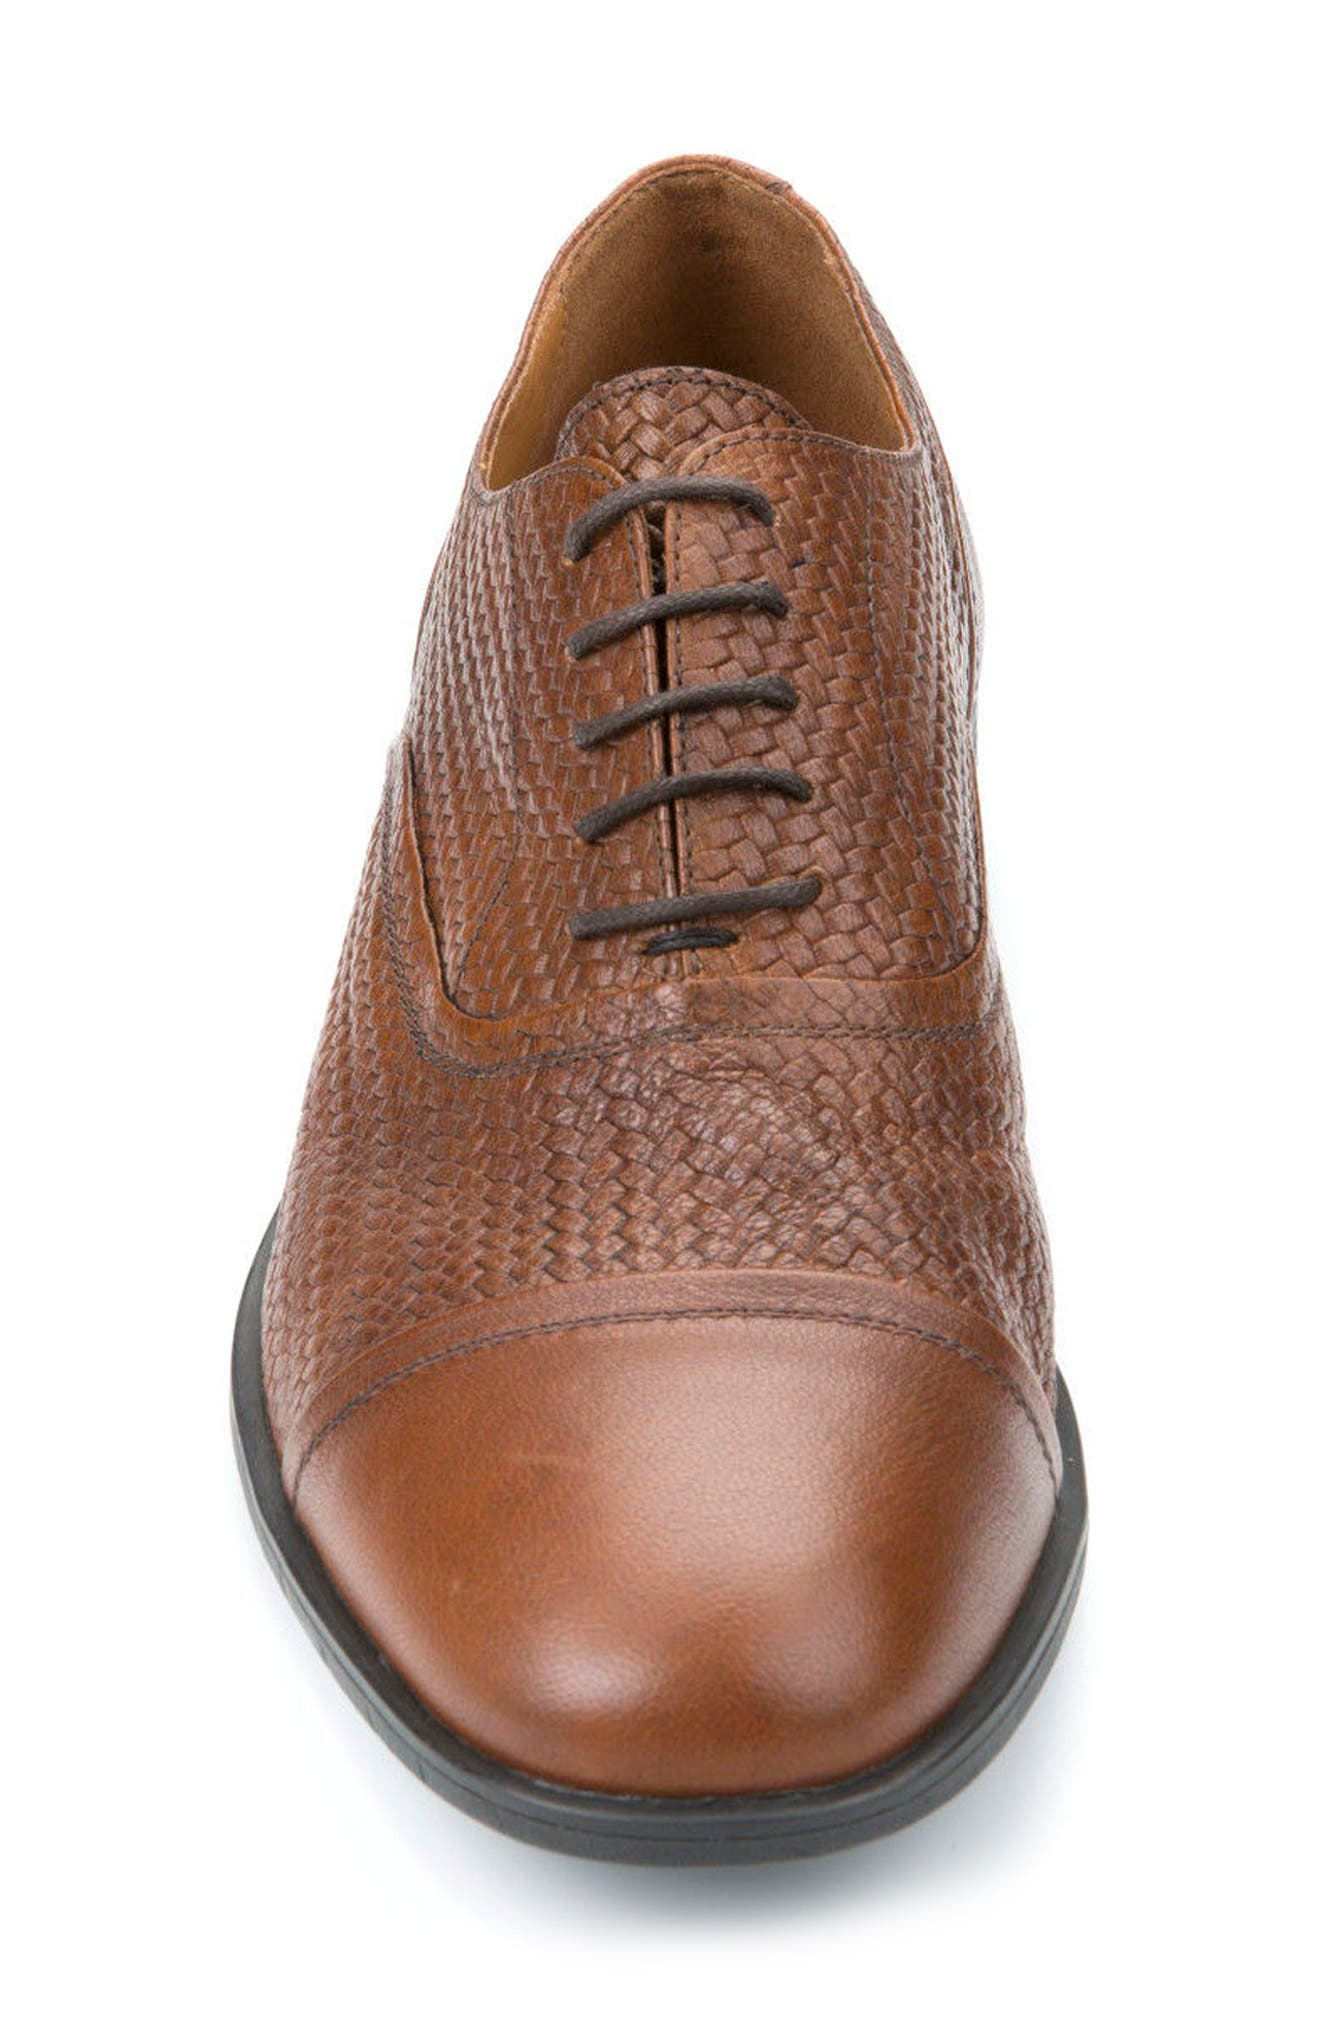 Alternate Image 4  - Geox Bryceton Textured Cap Toe Oxford (Men)